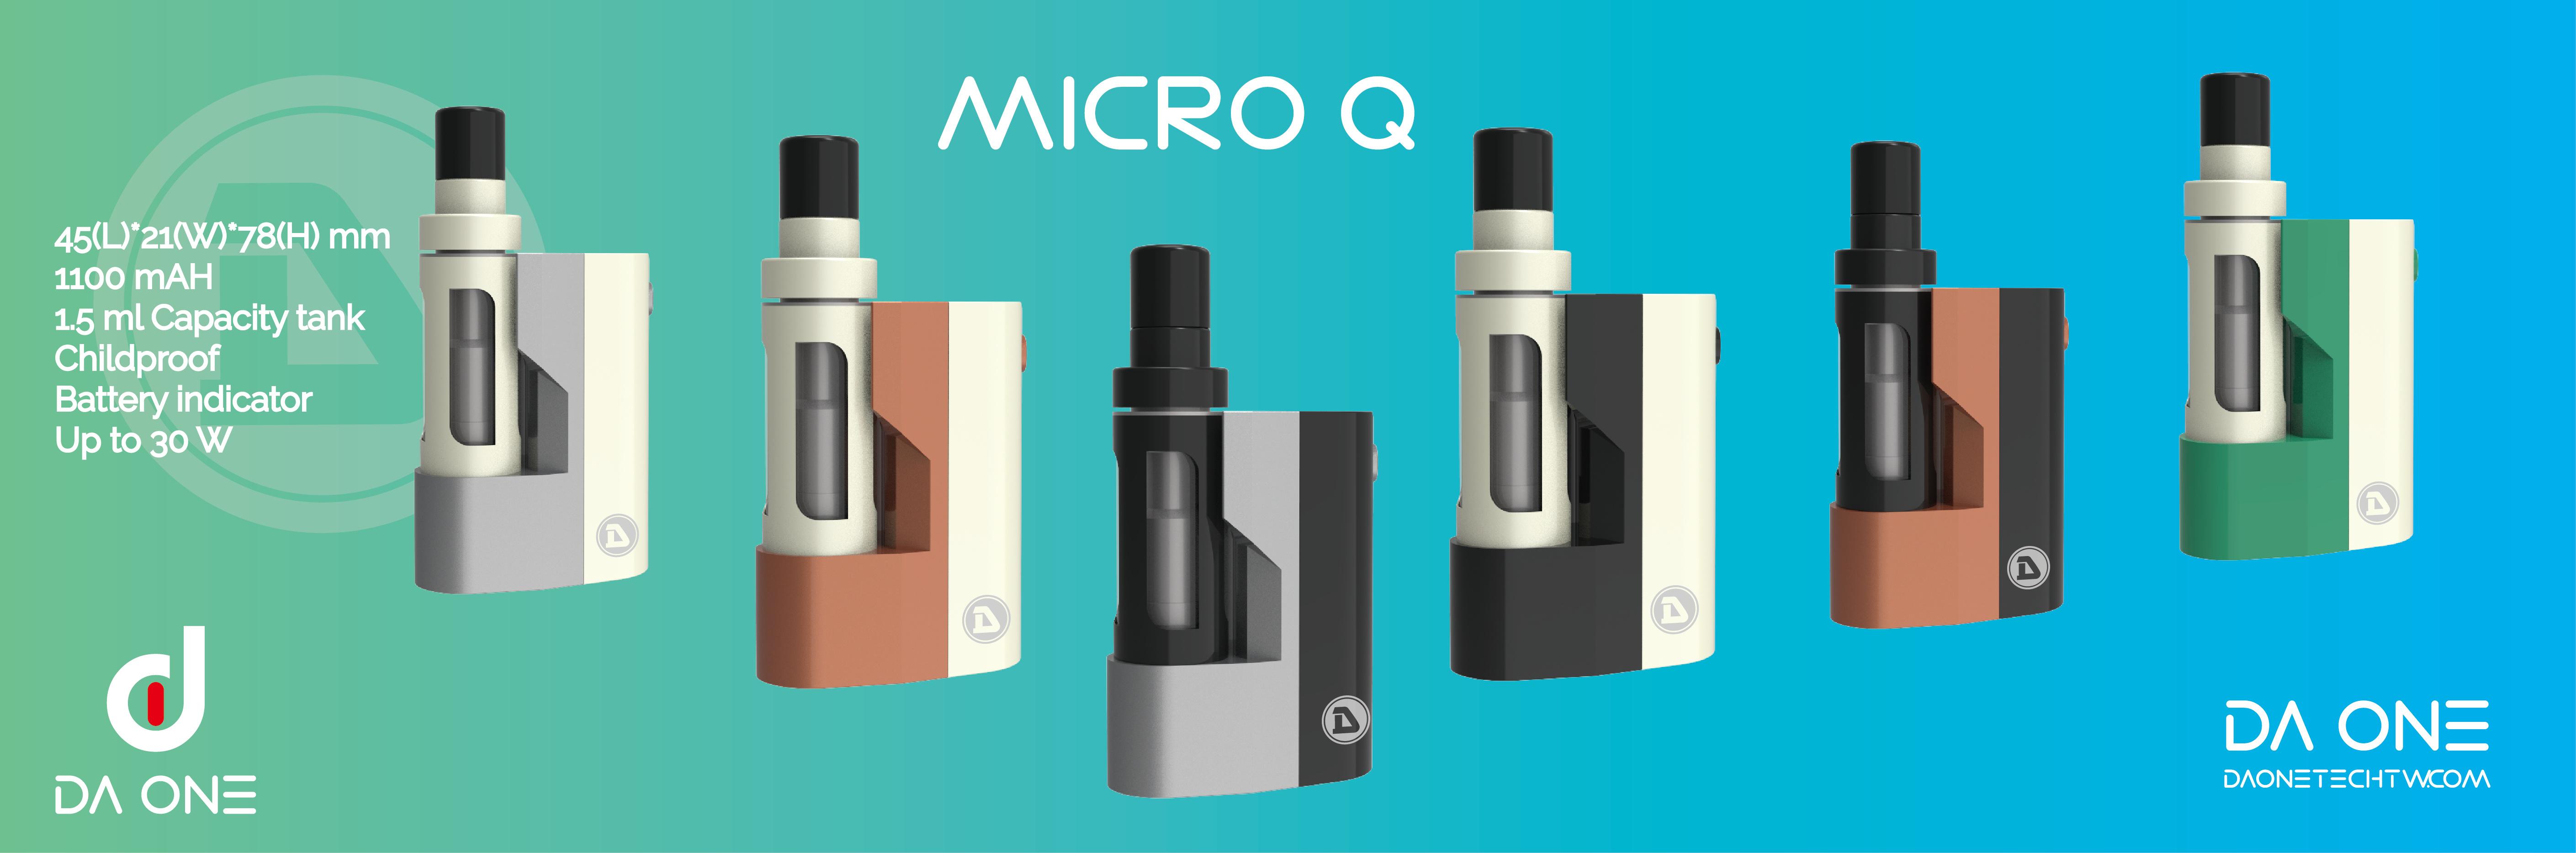 MICROQ S webpage-01